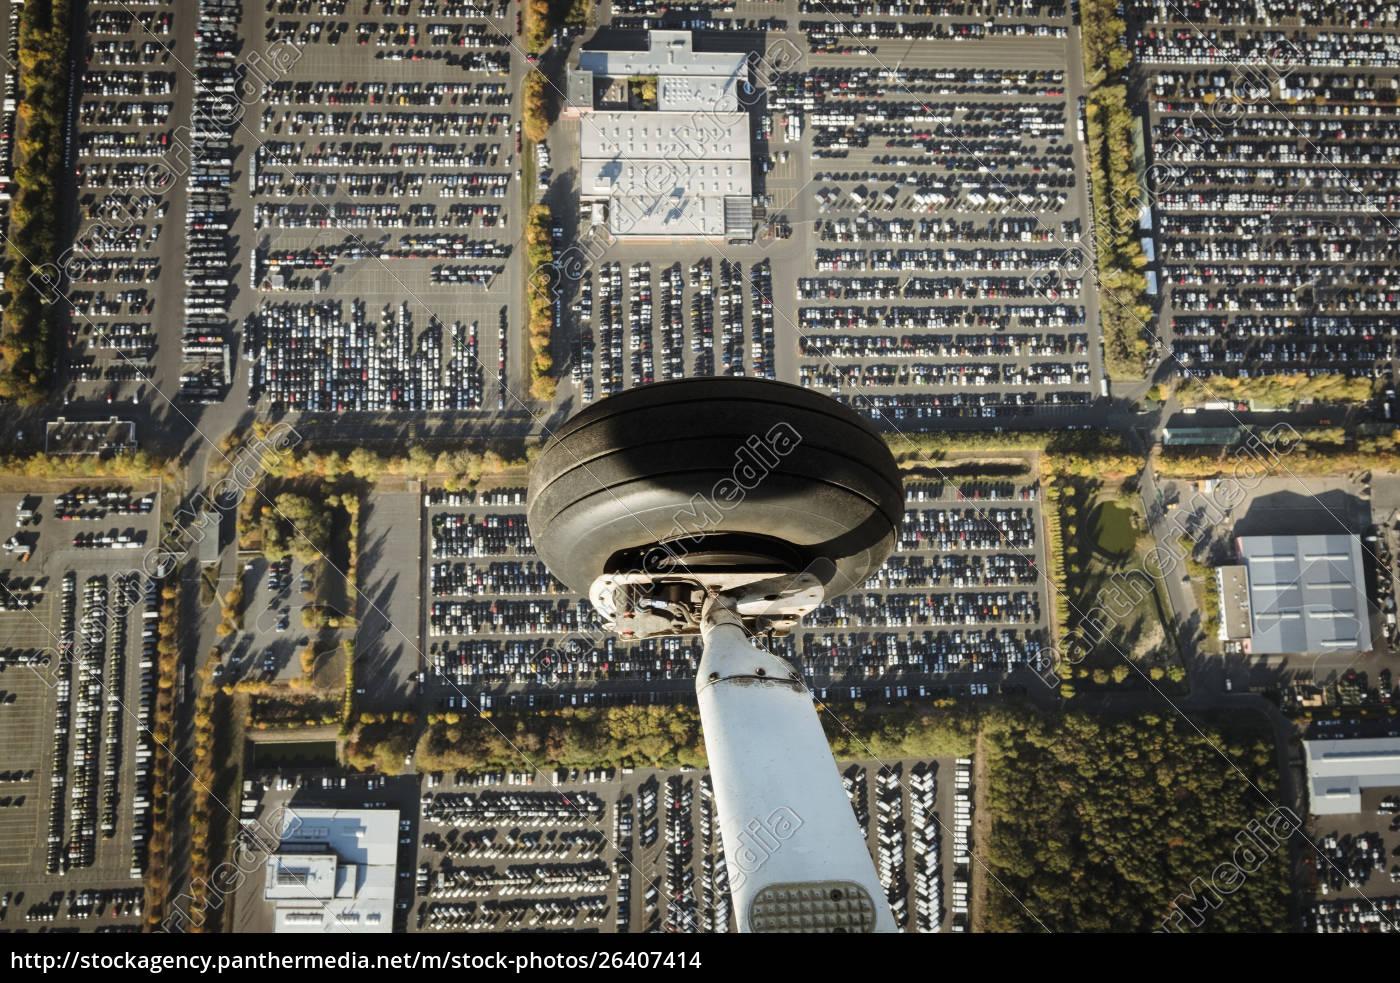 luftbild, flugzeugrad, das, über, parkplätze, fliegt - 26407414